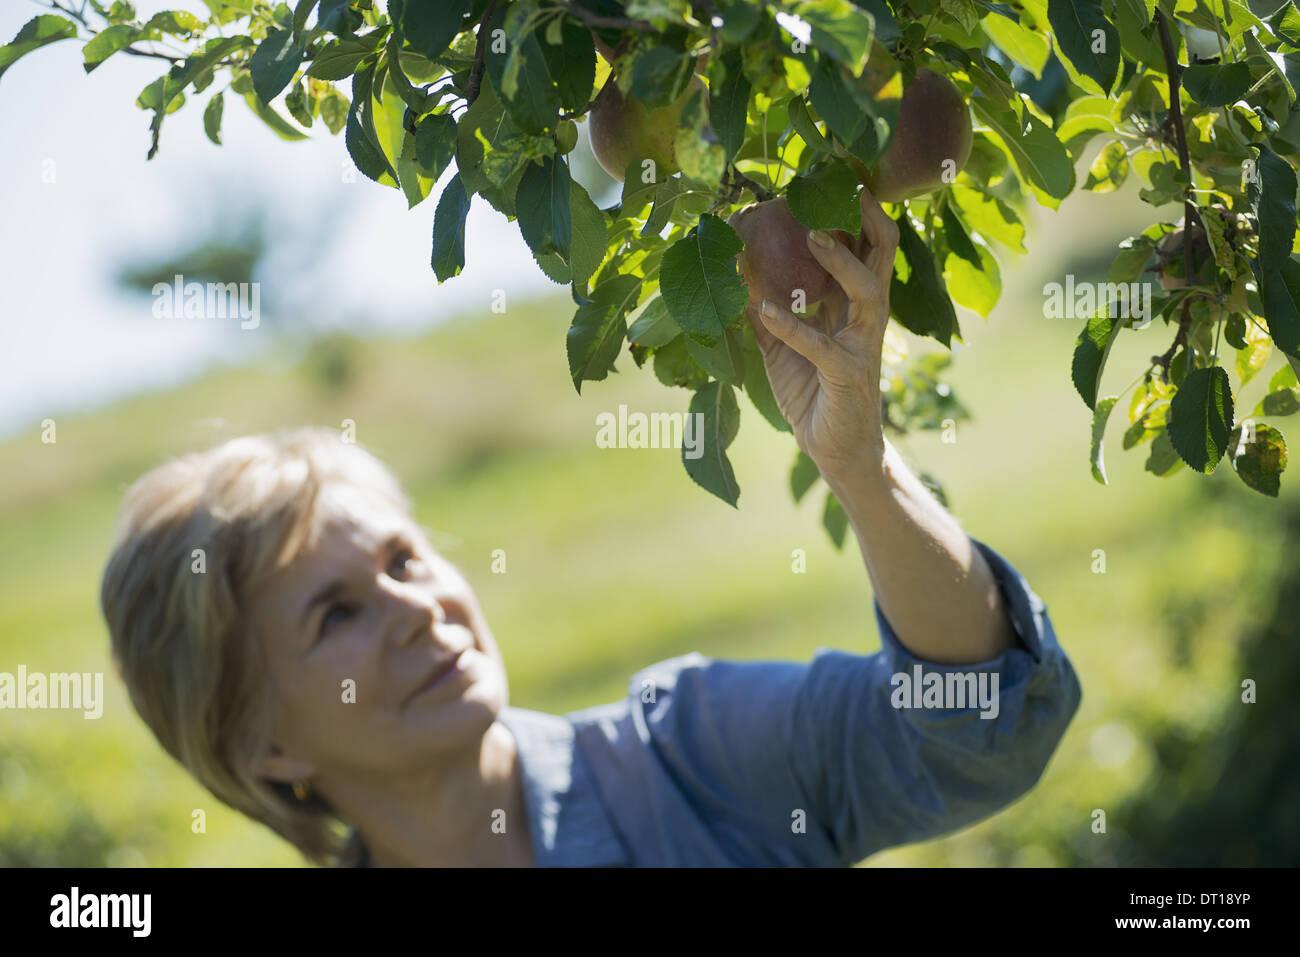 Woodstock New York USA Middle-aged Woman Organic Macintosh Apple Tree - Stock Image